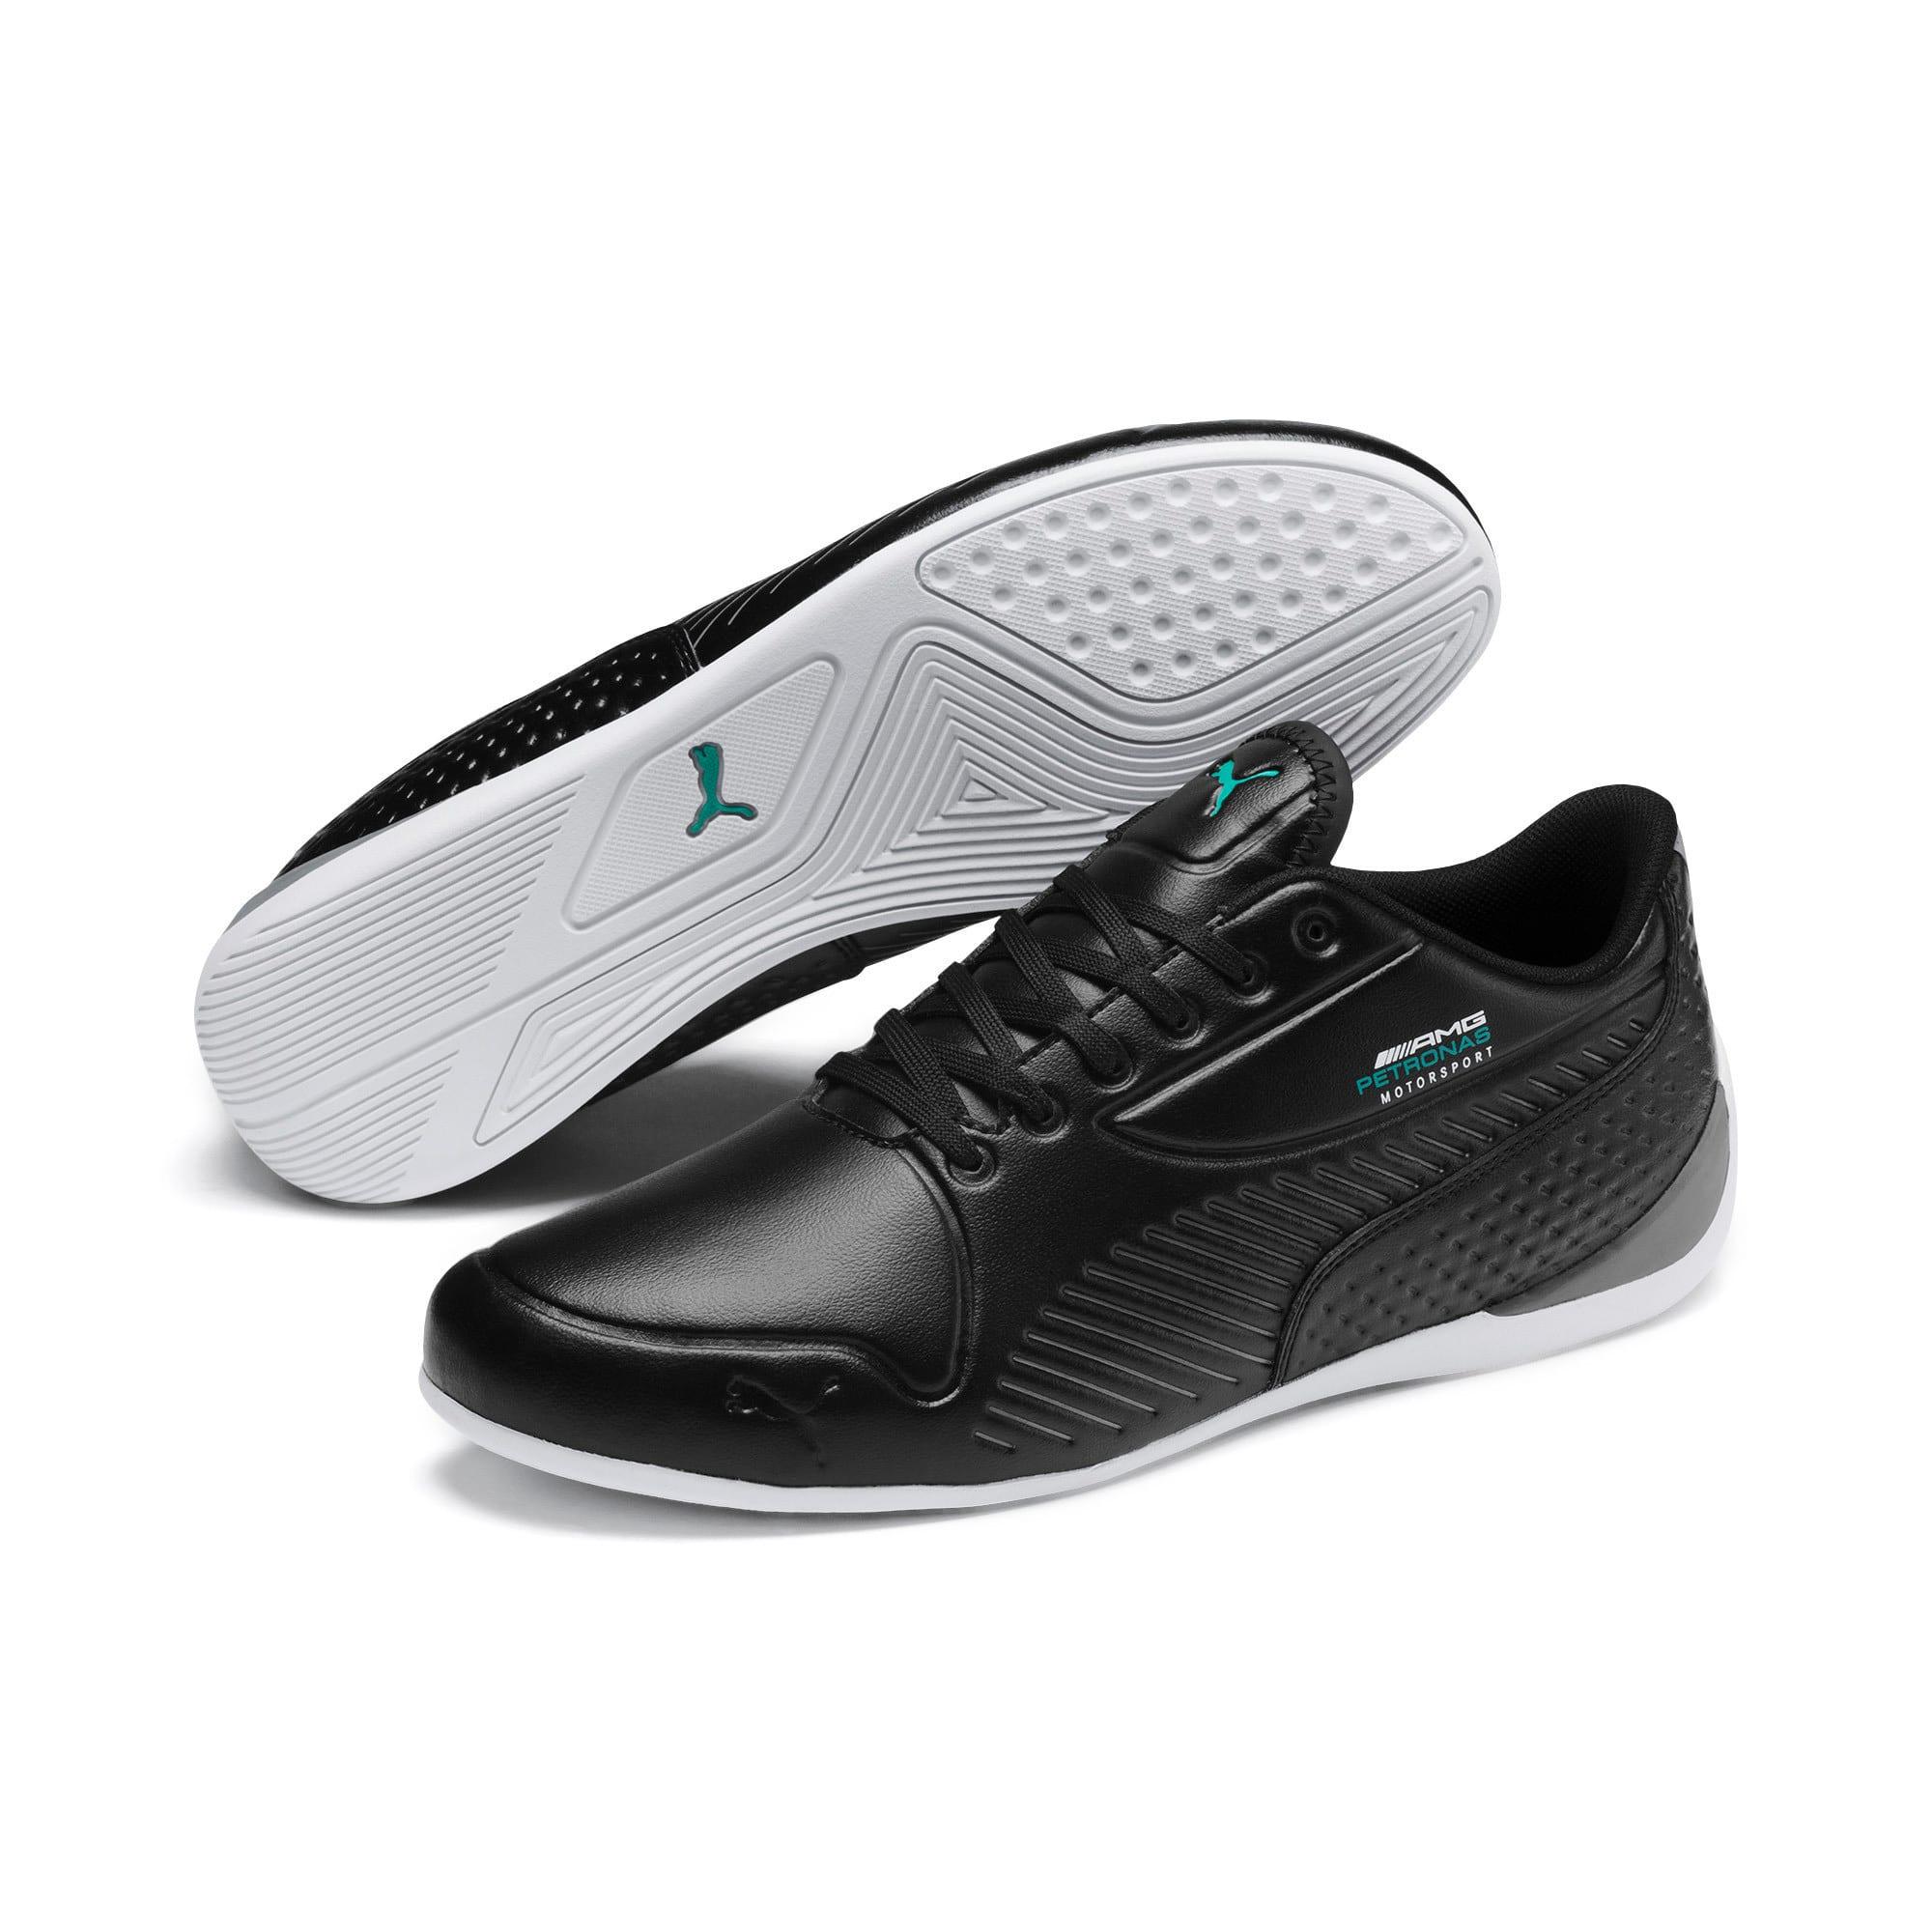 Thumbnail 3 of Mercedes AMG Petronas Drift Cat 7S Ultra Men's Shoes, Puma Black-Puma Black, medium